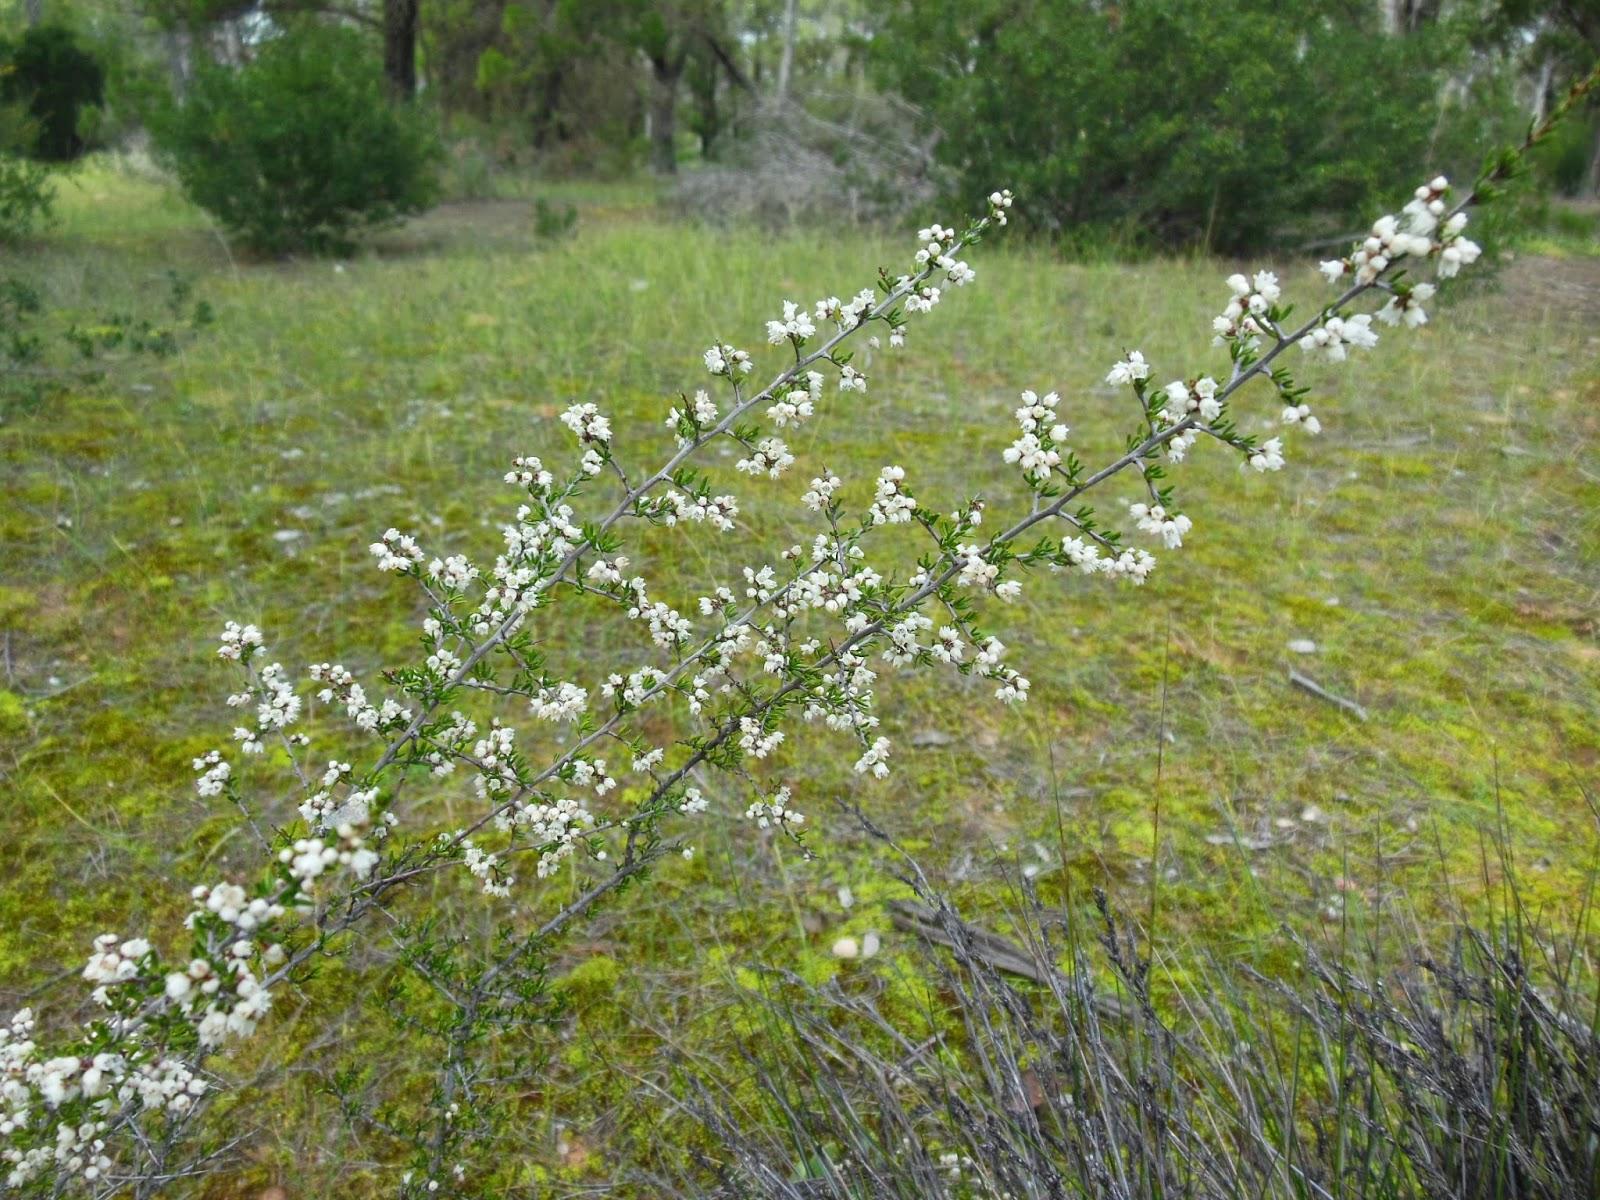 Australian Plants Society Northern Yorke Peninsula Group Flowering